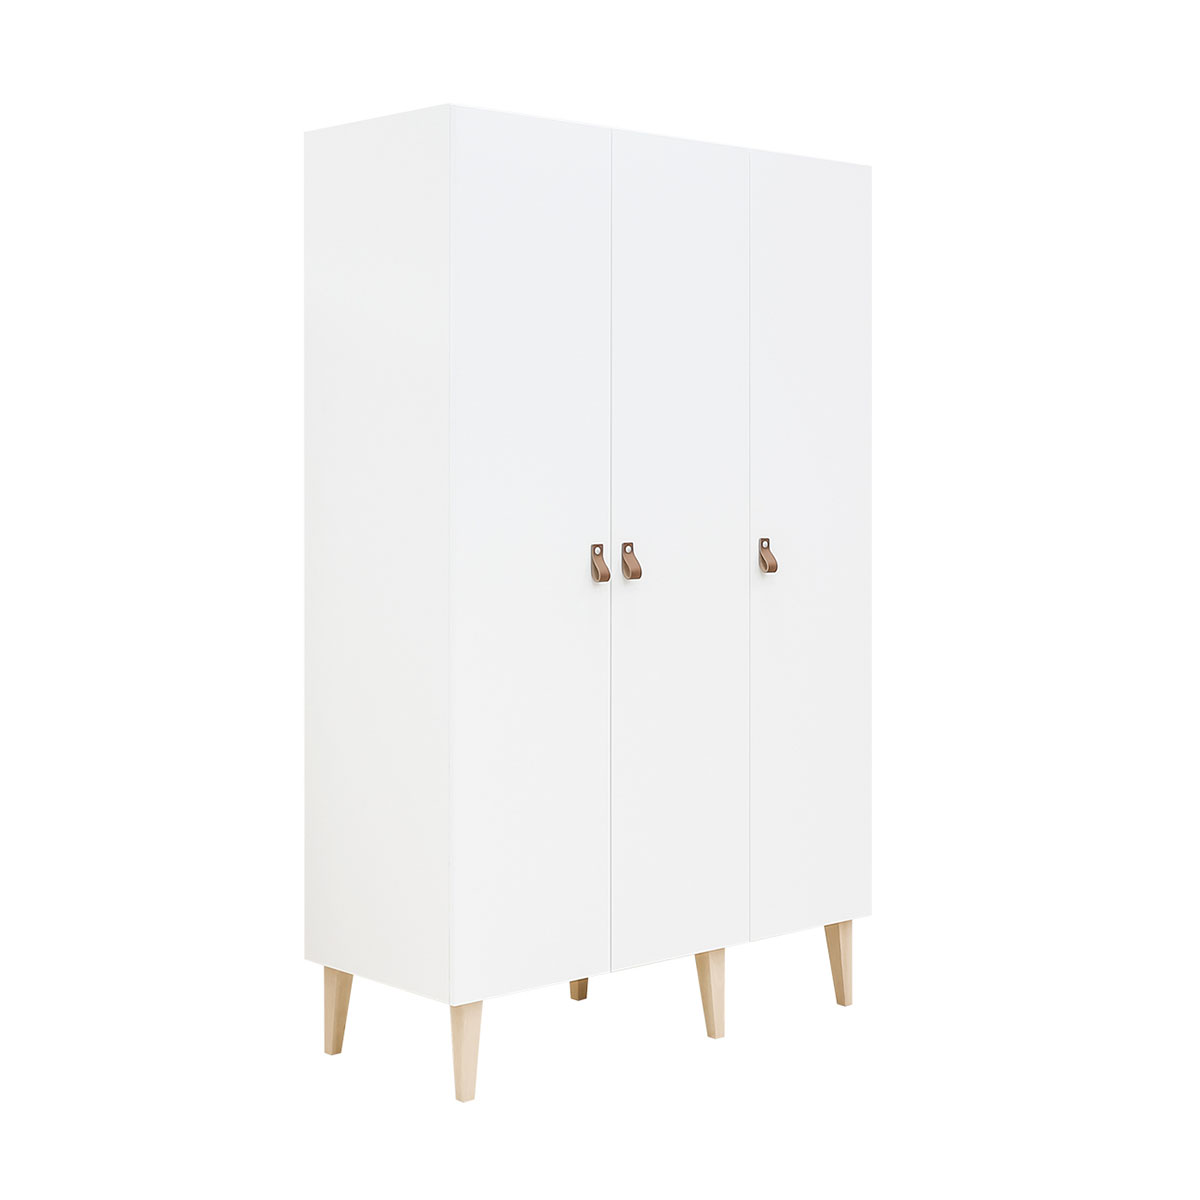 Armoire 3 portes blanc bois naturel